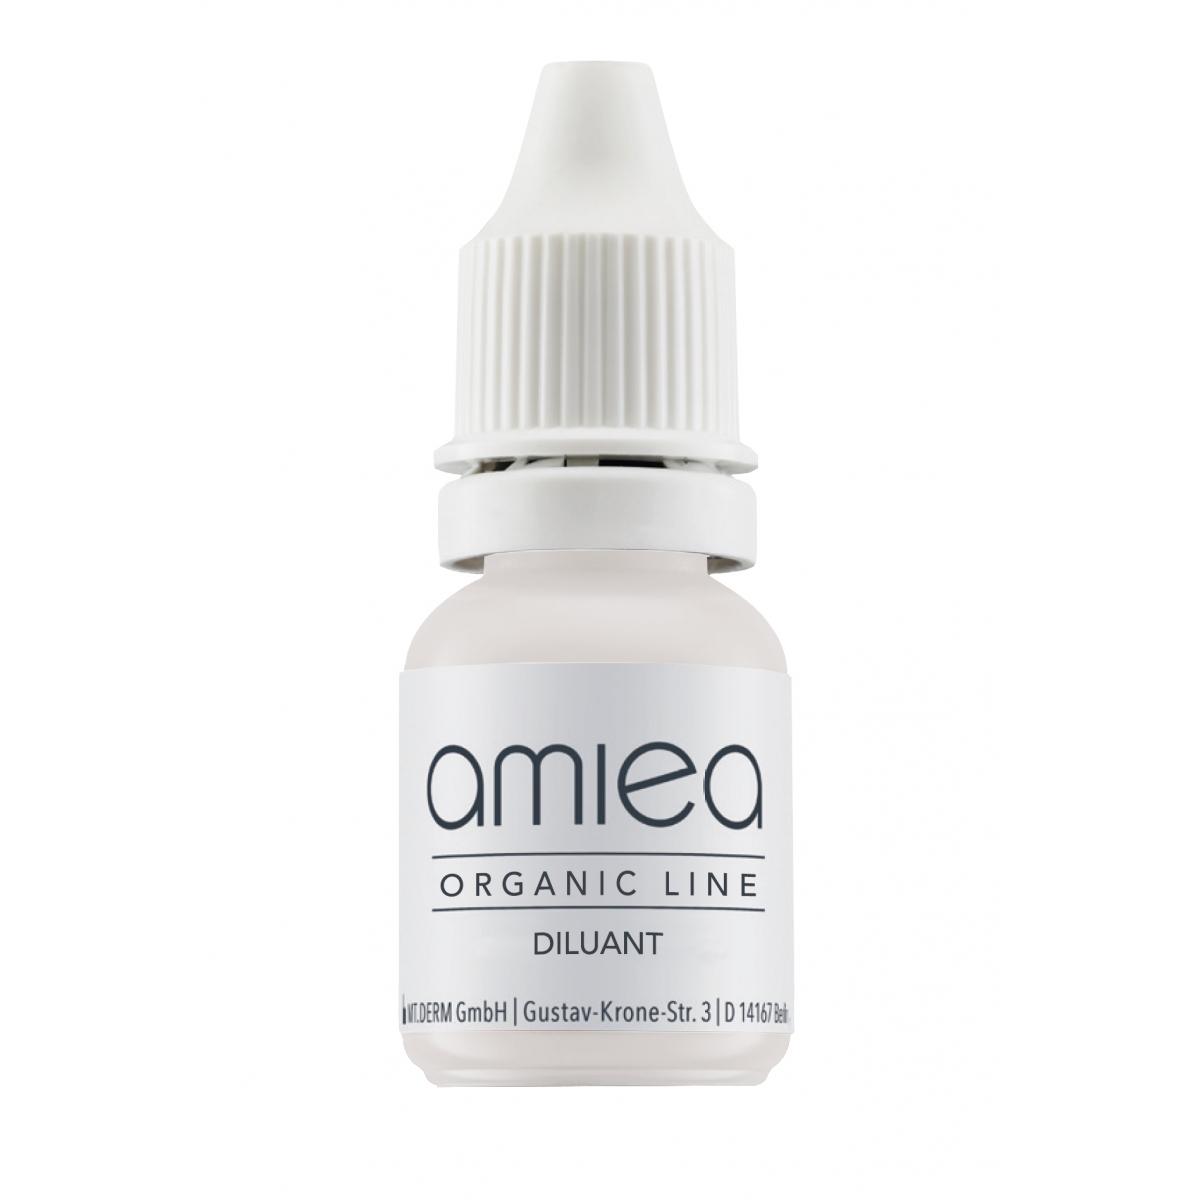 Organicline (5 ml)  - PIGMENTS AMIEA ORGANICLINE DILUANT, Flacon 5 ml